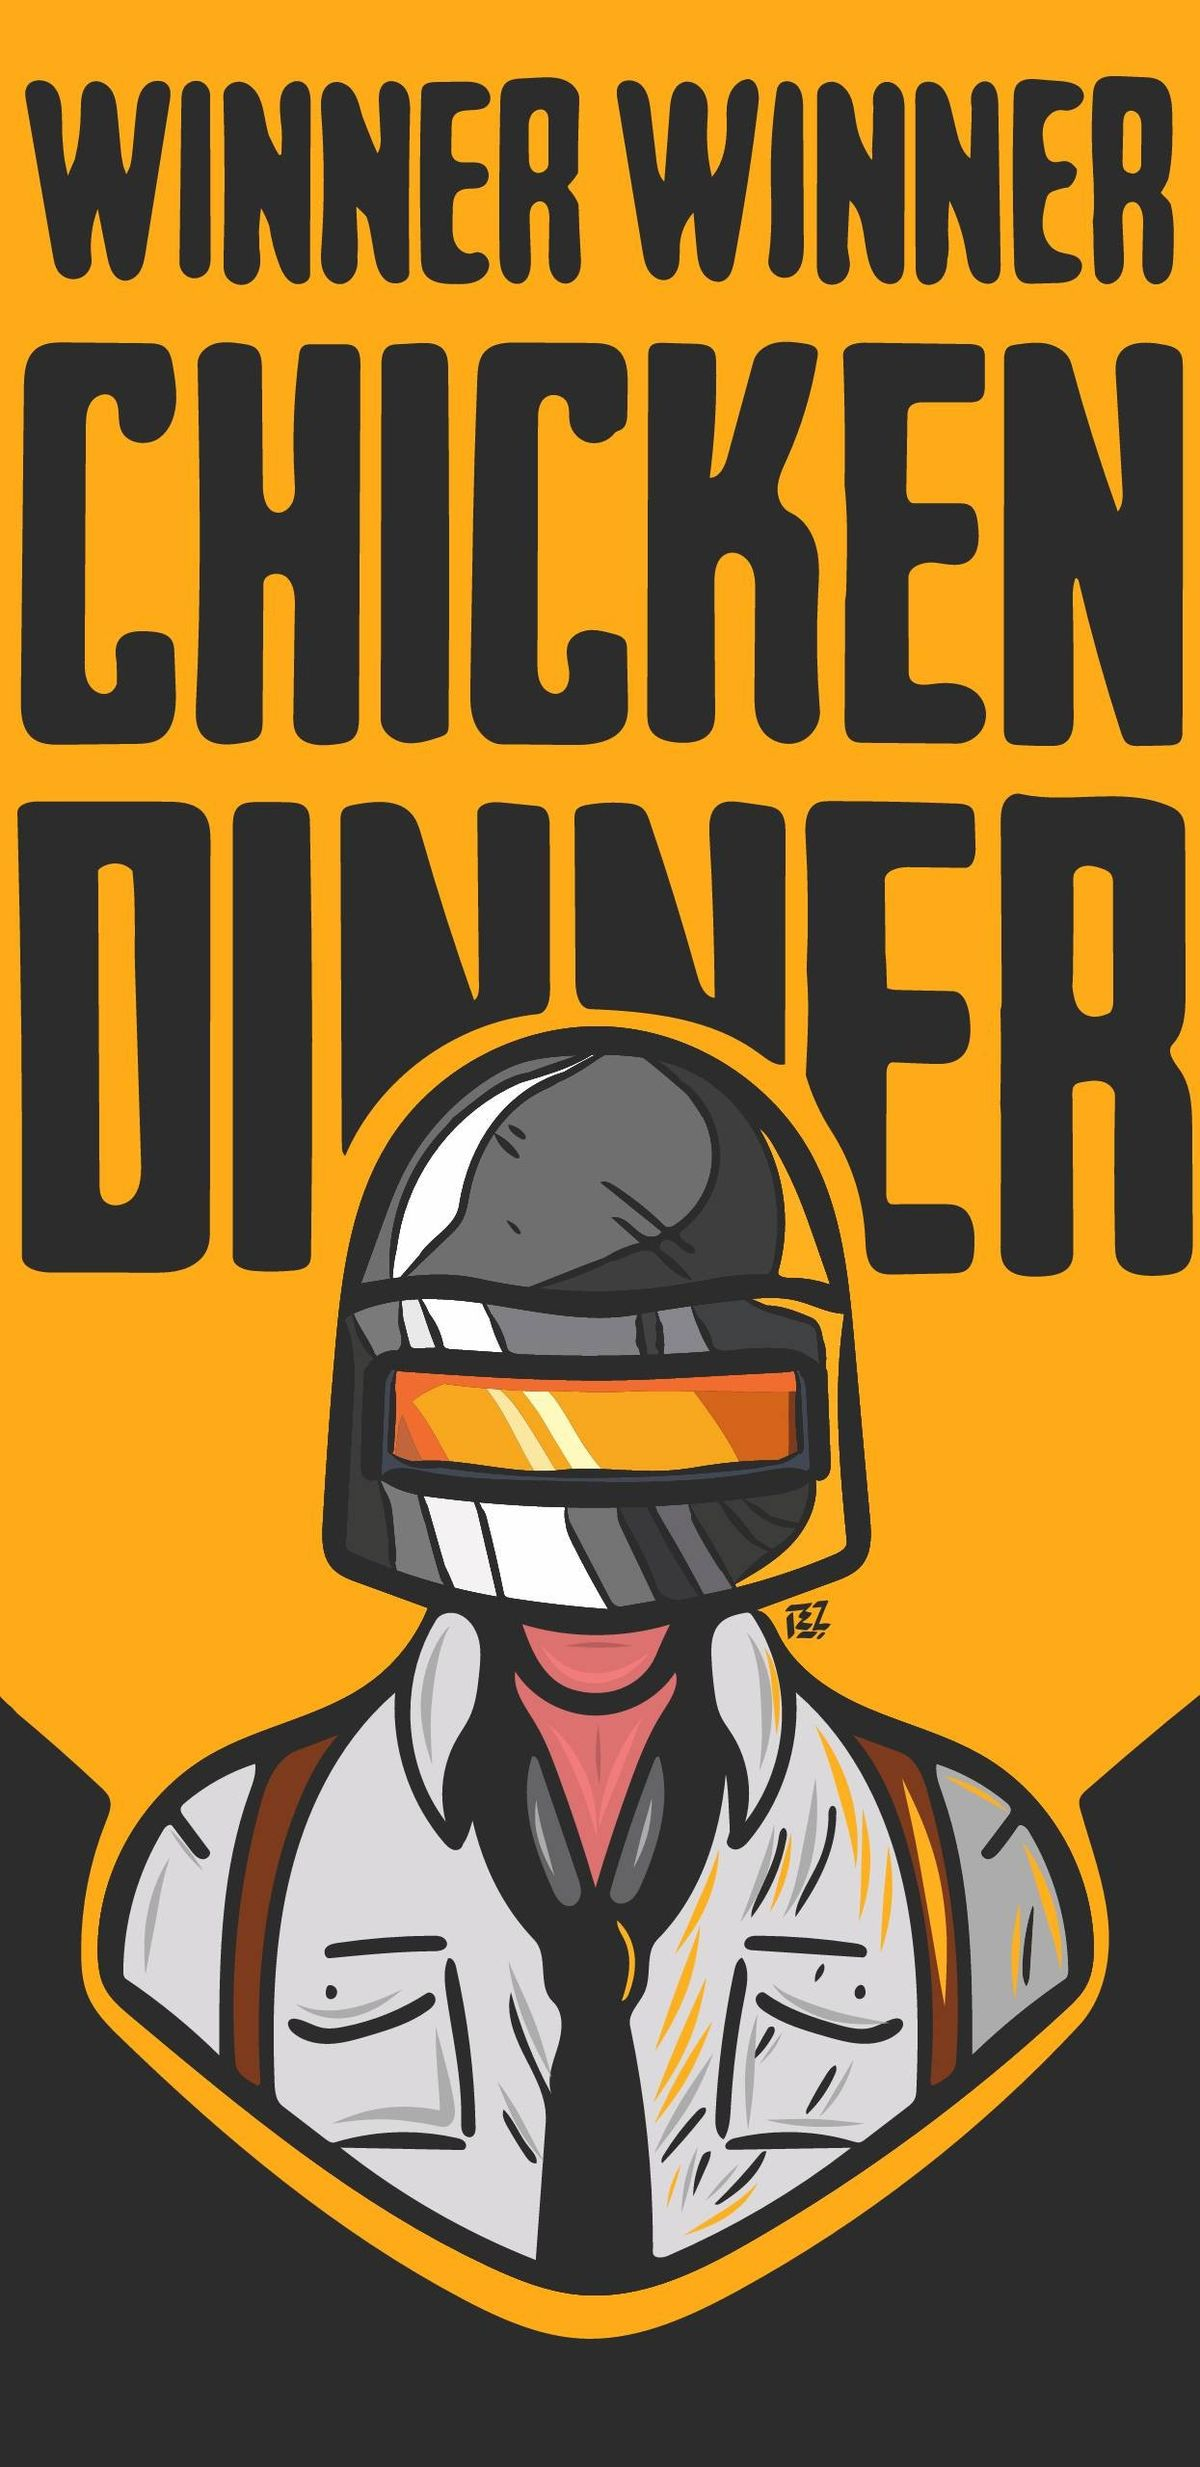 Pin by Tayeeb on Walldrobe Winner winner chicken dinner